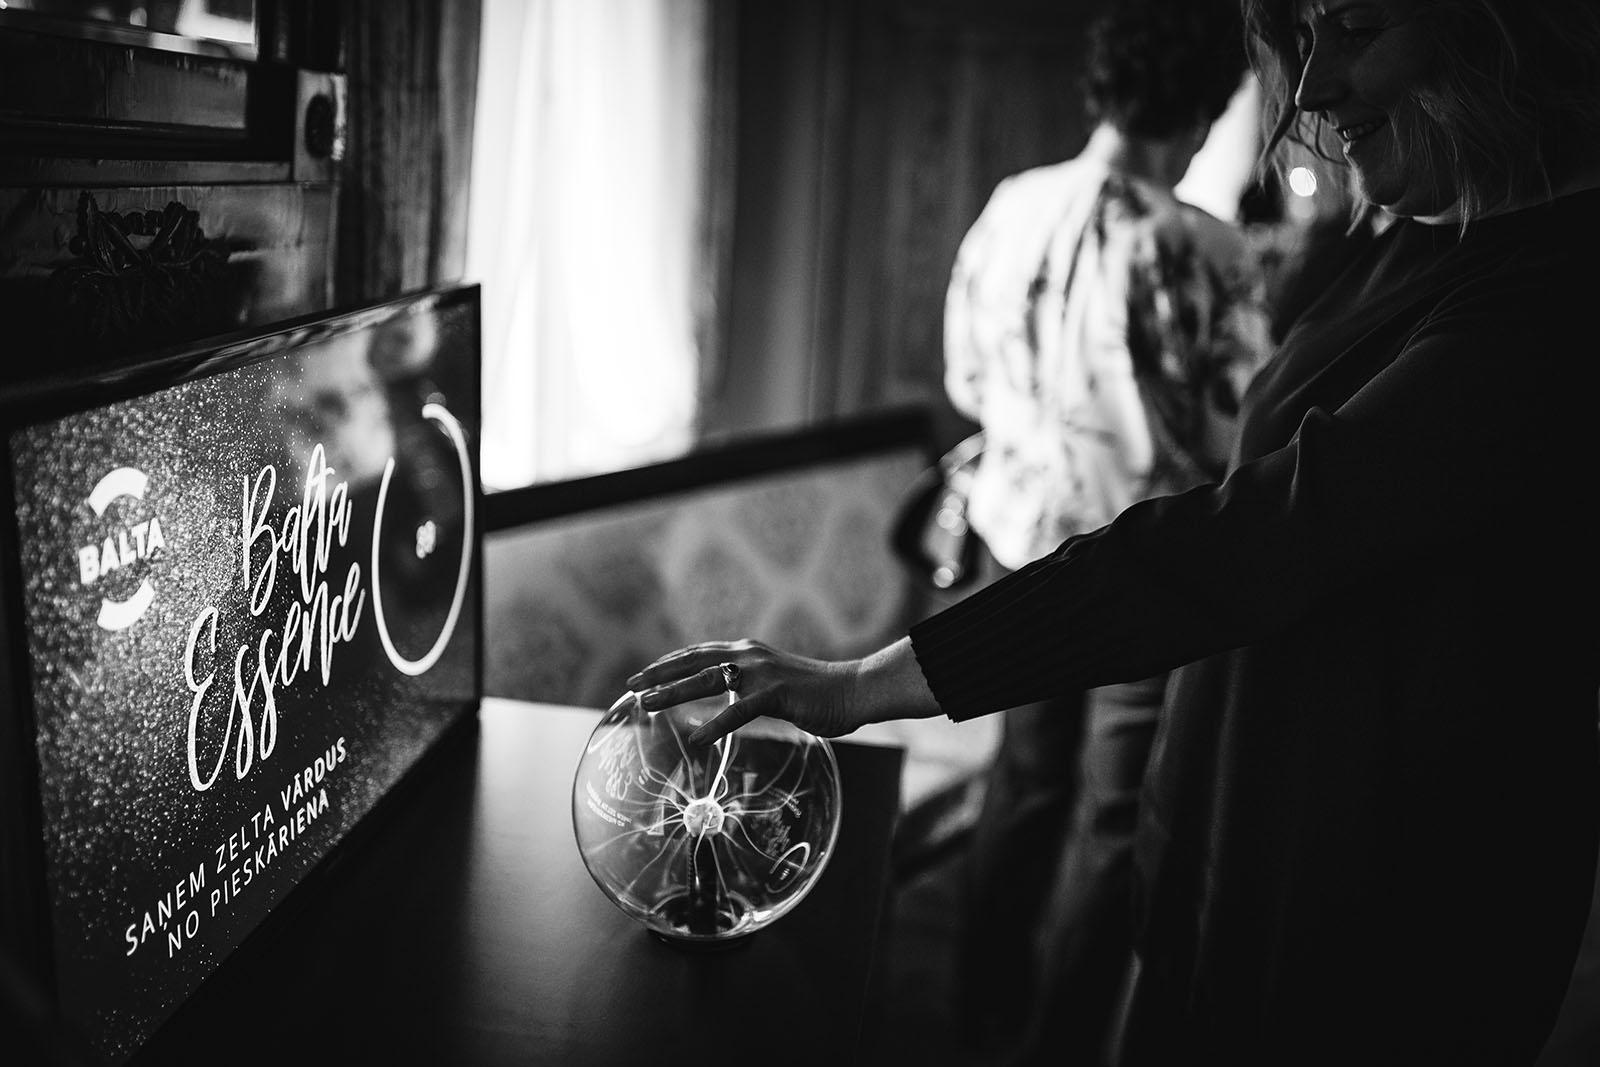 untitled-16.05.2019-Fotografs-Juris-Zigelis-206